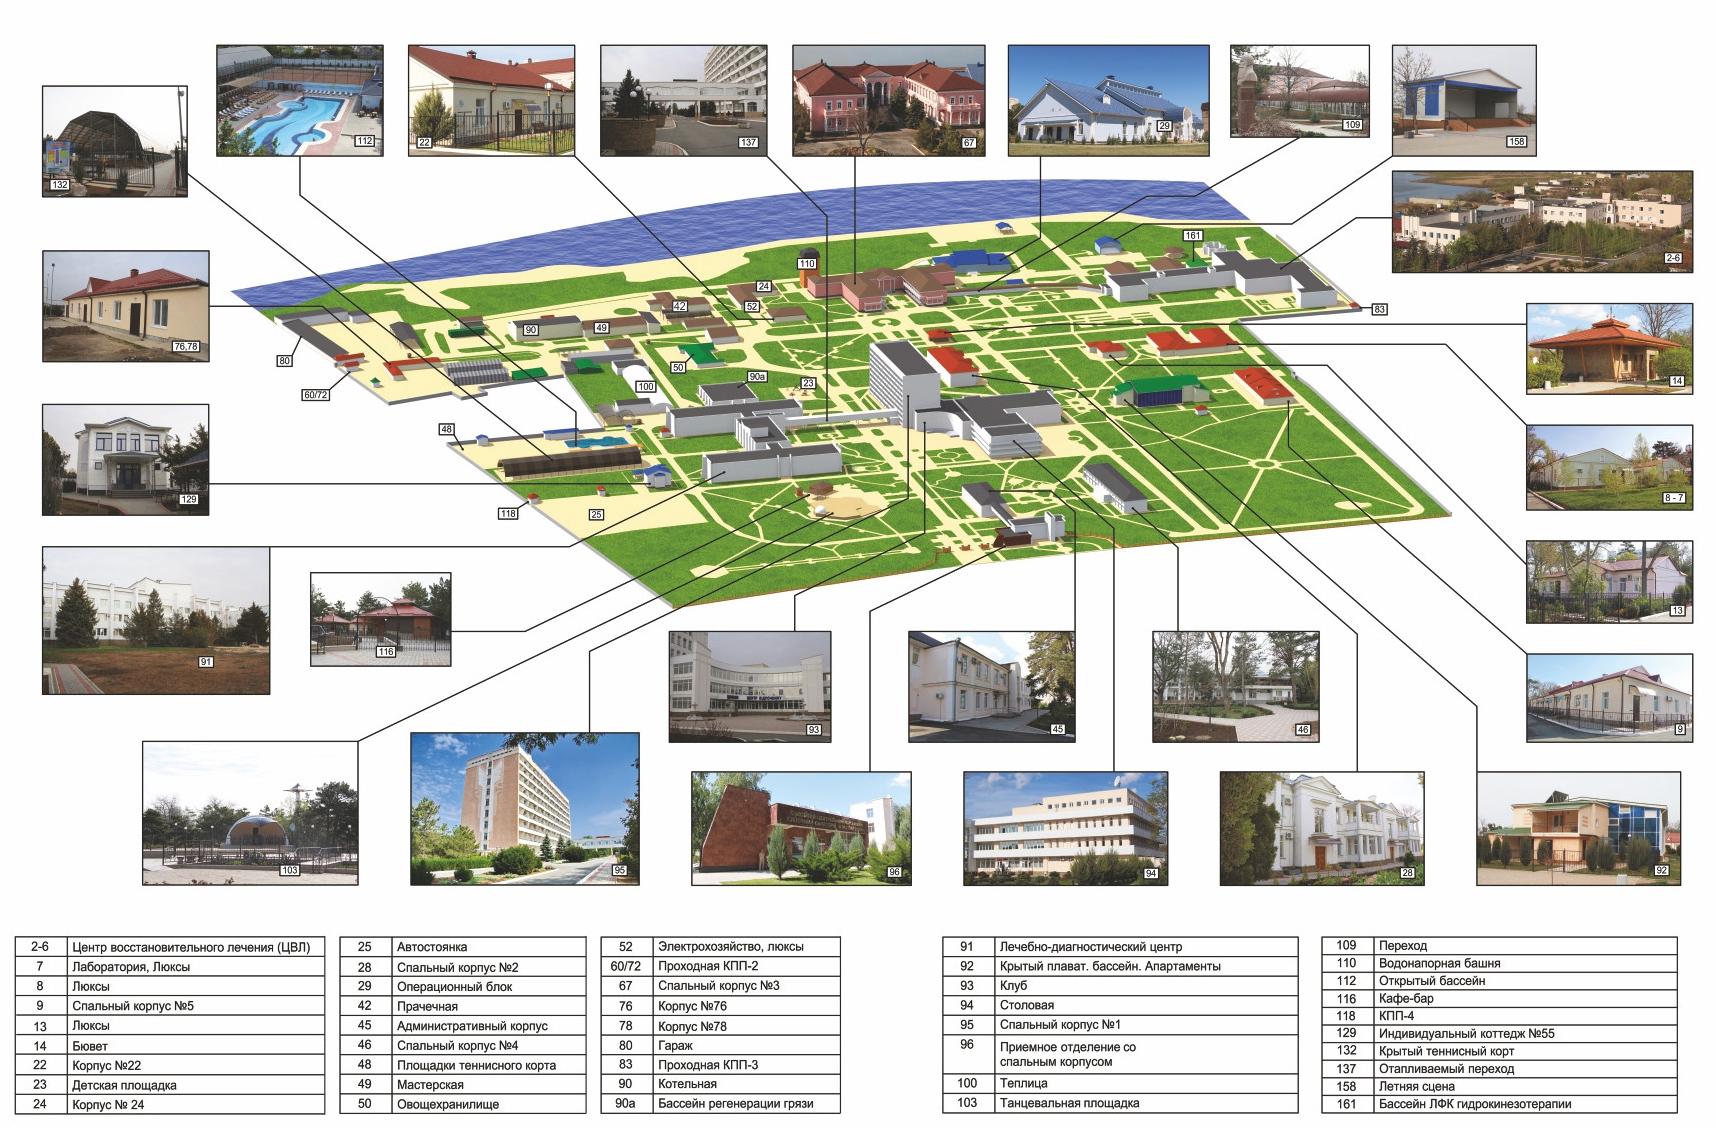 Карта санатория им. Пирогова